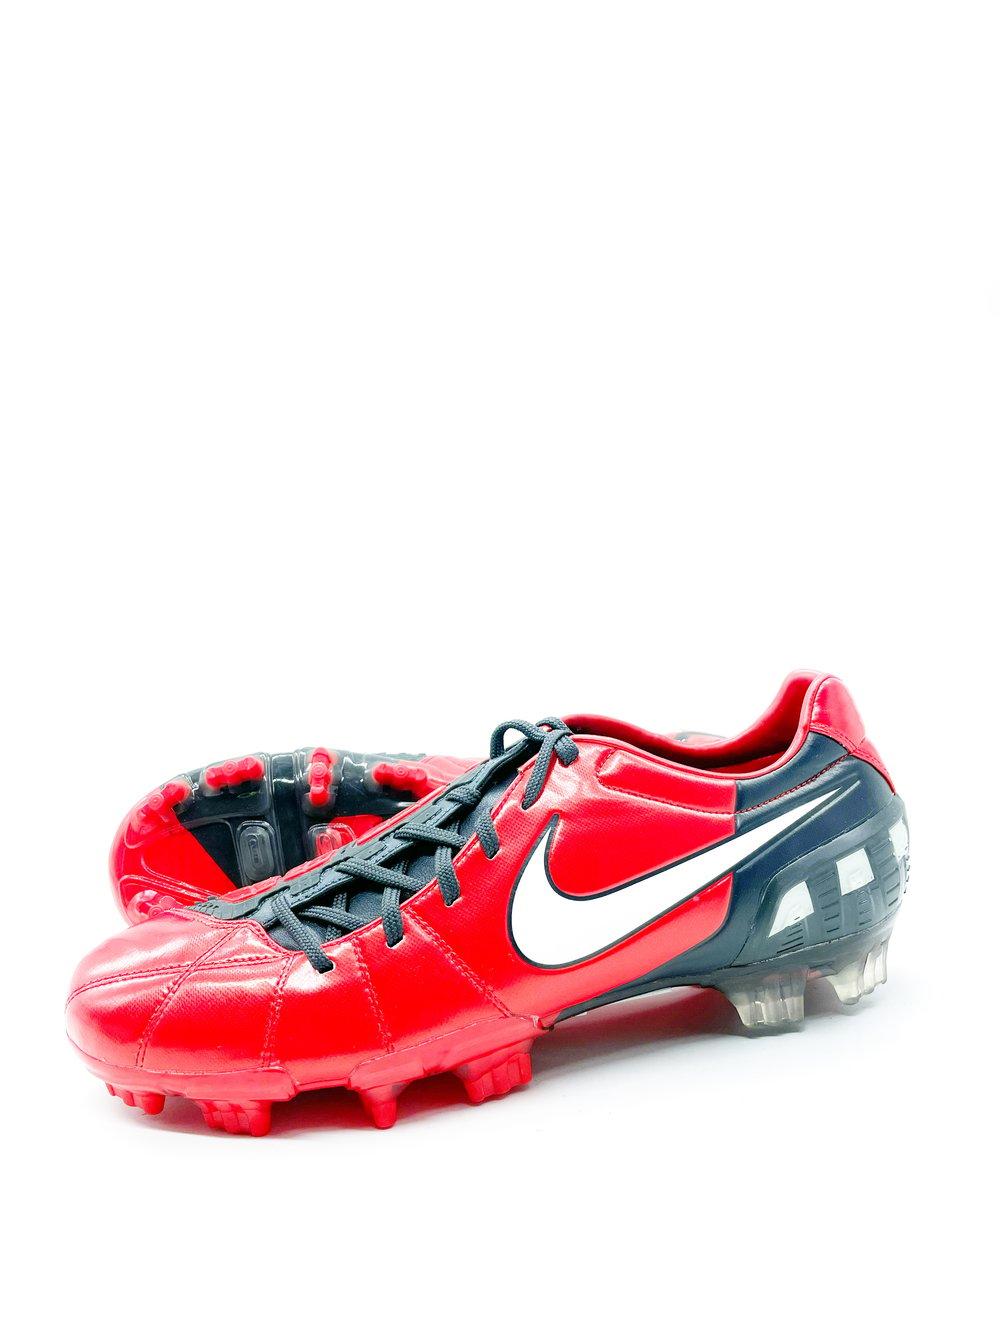 Image of Nike total90 laser red